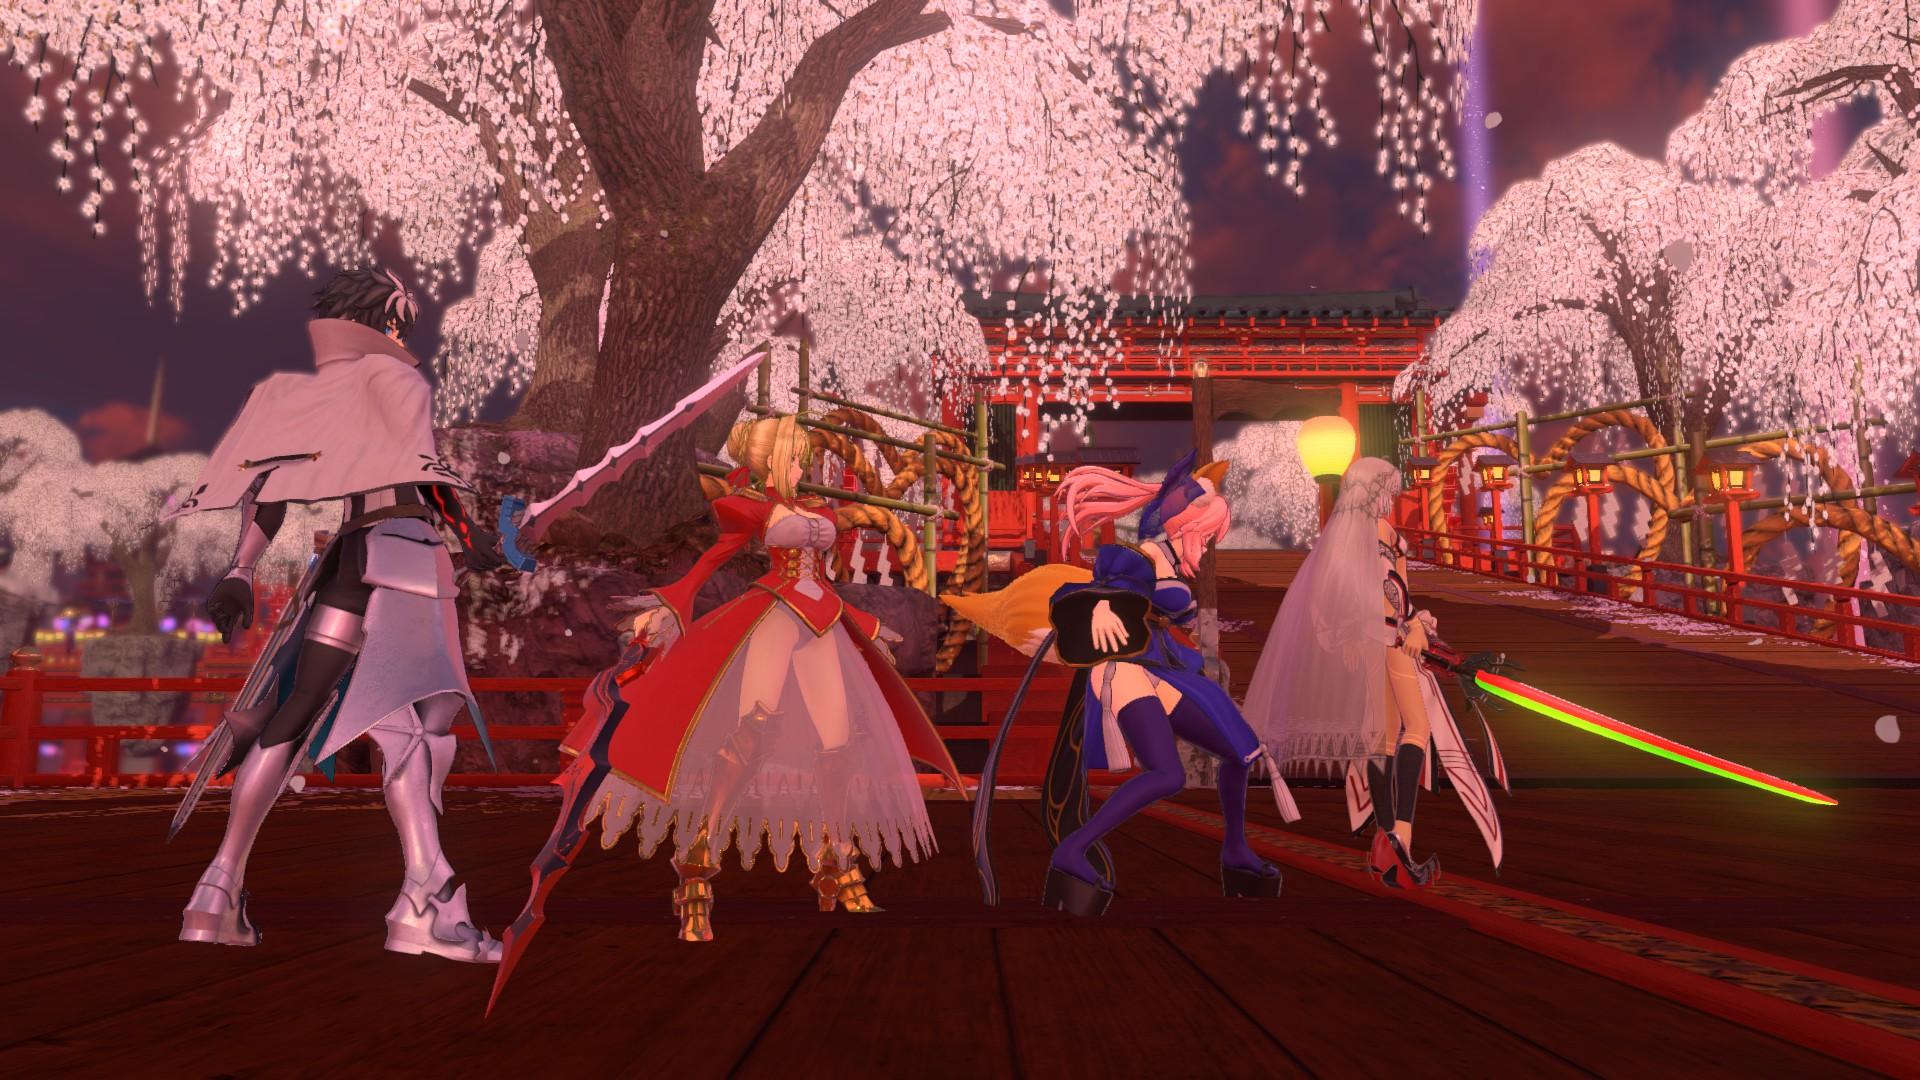 《Fate/EXTELLA LINK》Steam版3月发售 支持简中